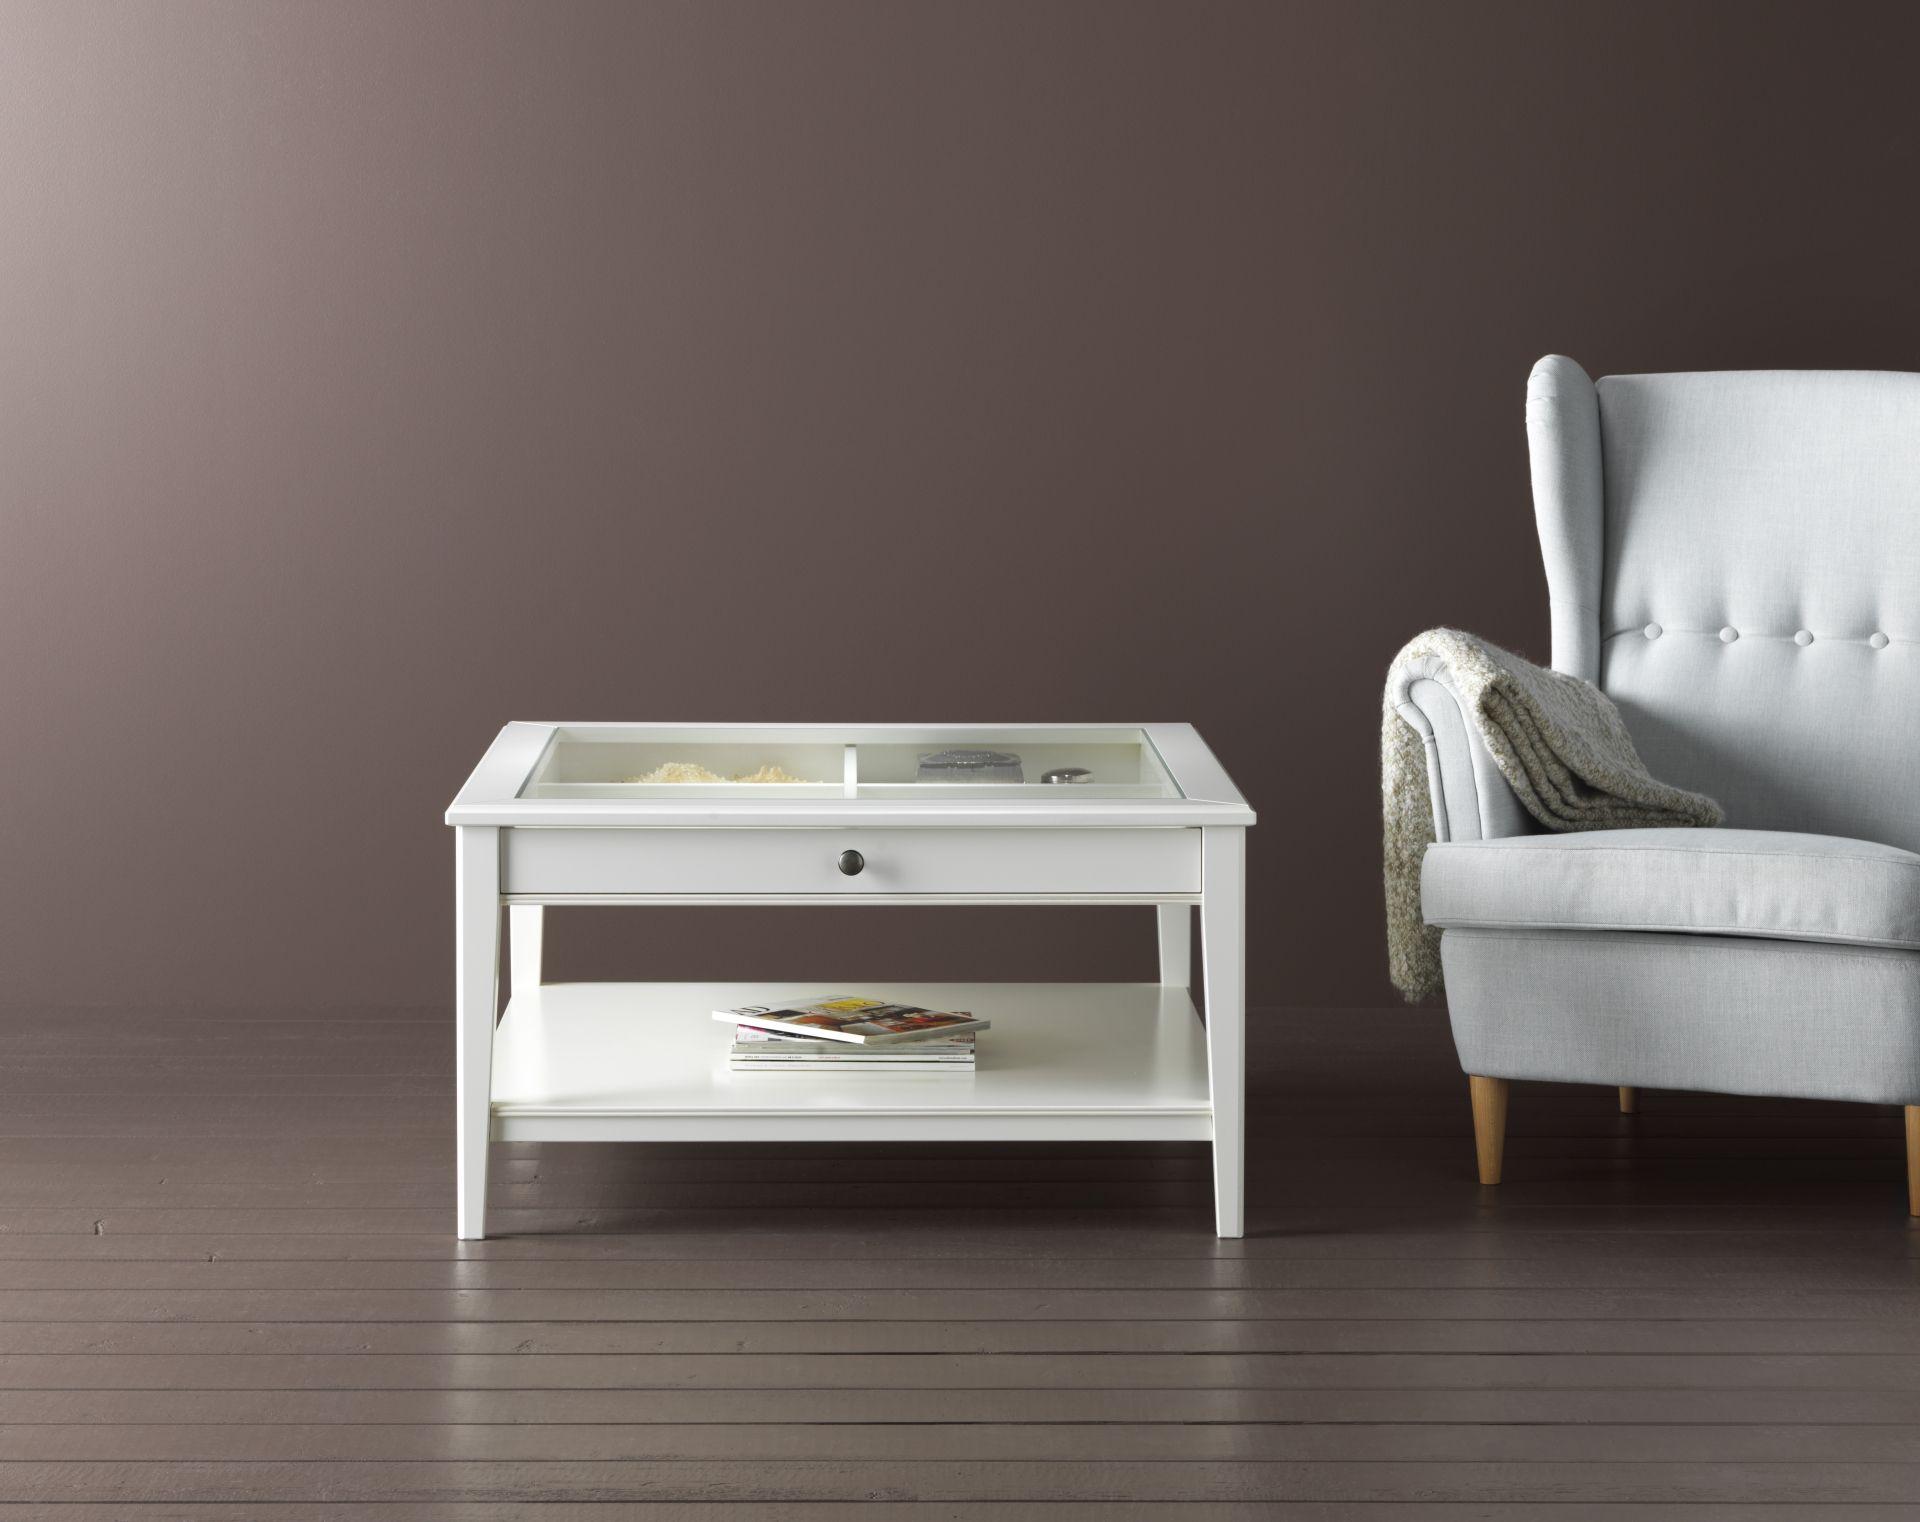 Glazen Tafel Ikea : Liatorp salontafel wit glas ikea catalogus 2017 pinterest